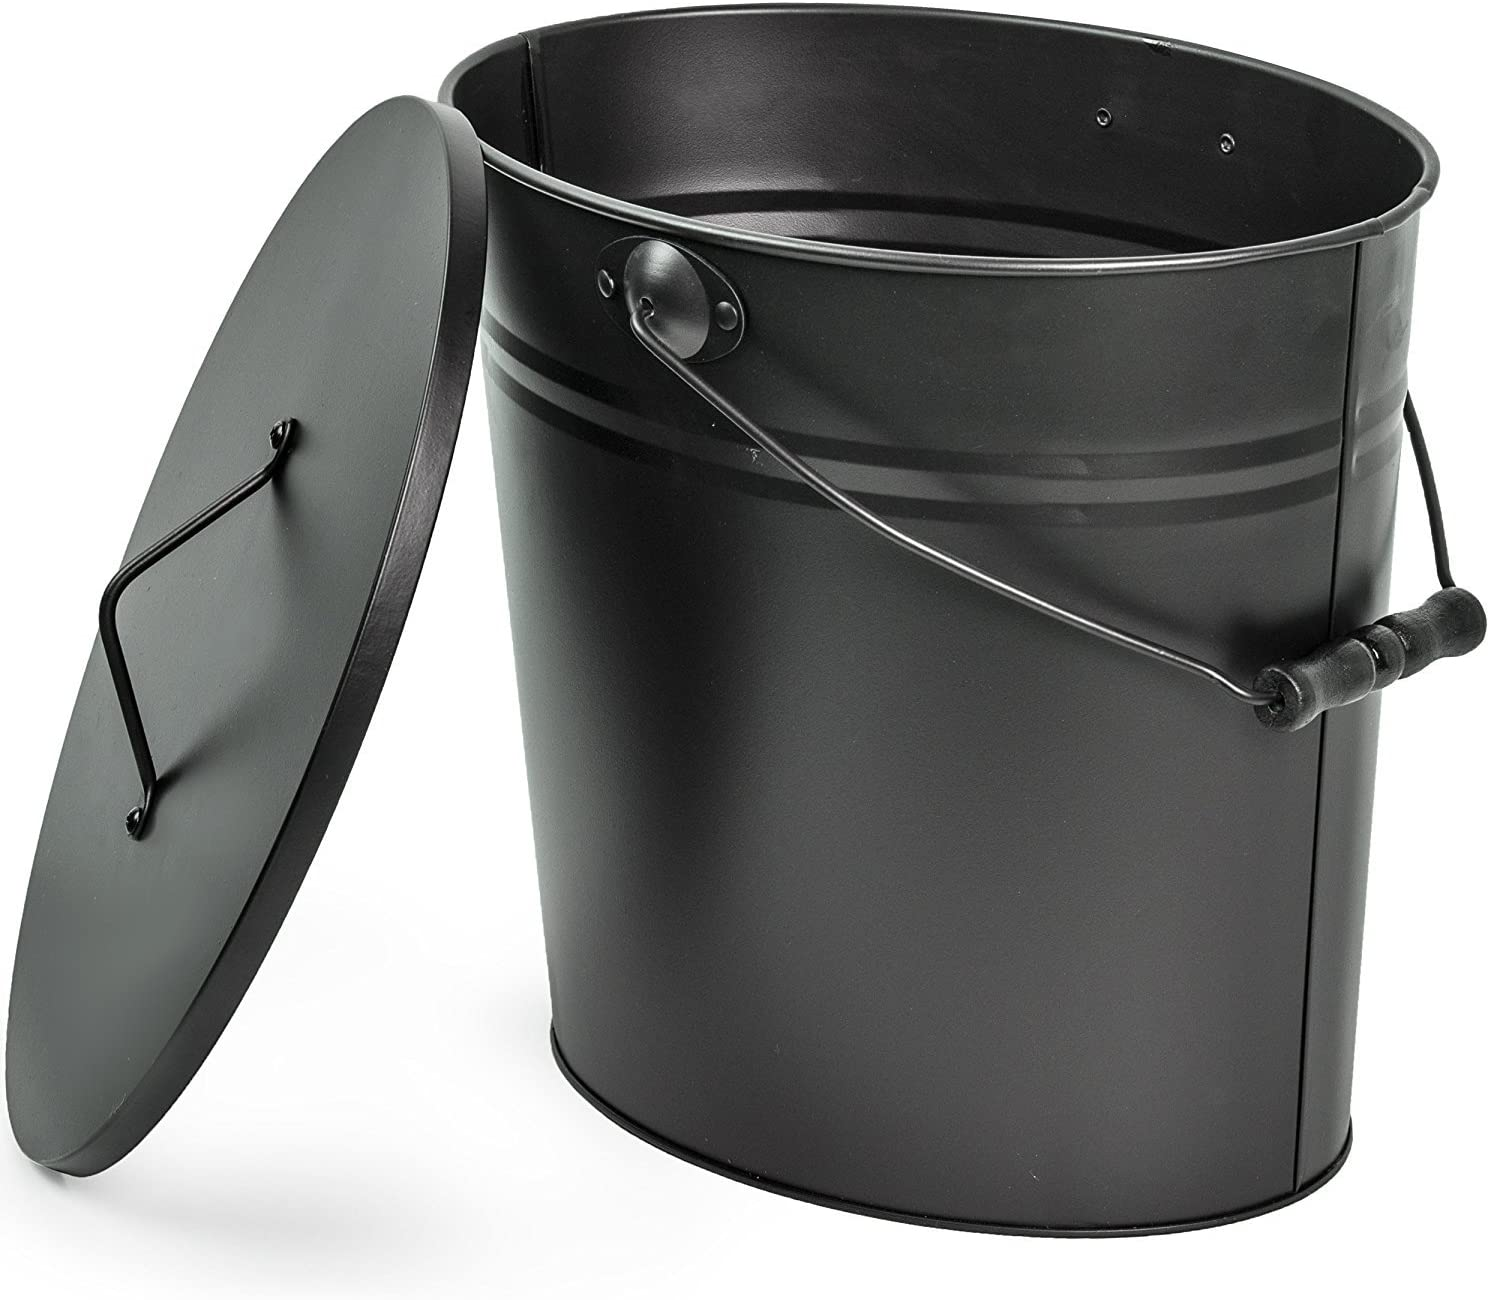 Estufa de le/ña Negro Cubo portador de cenizas Herramientas para chimenea Cubo para cenizas con tapa y mango de madera Pala para carb/ón Fogata